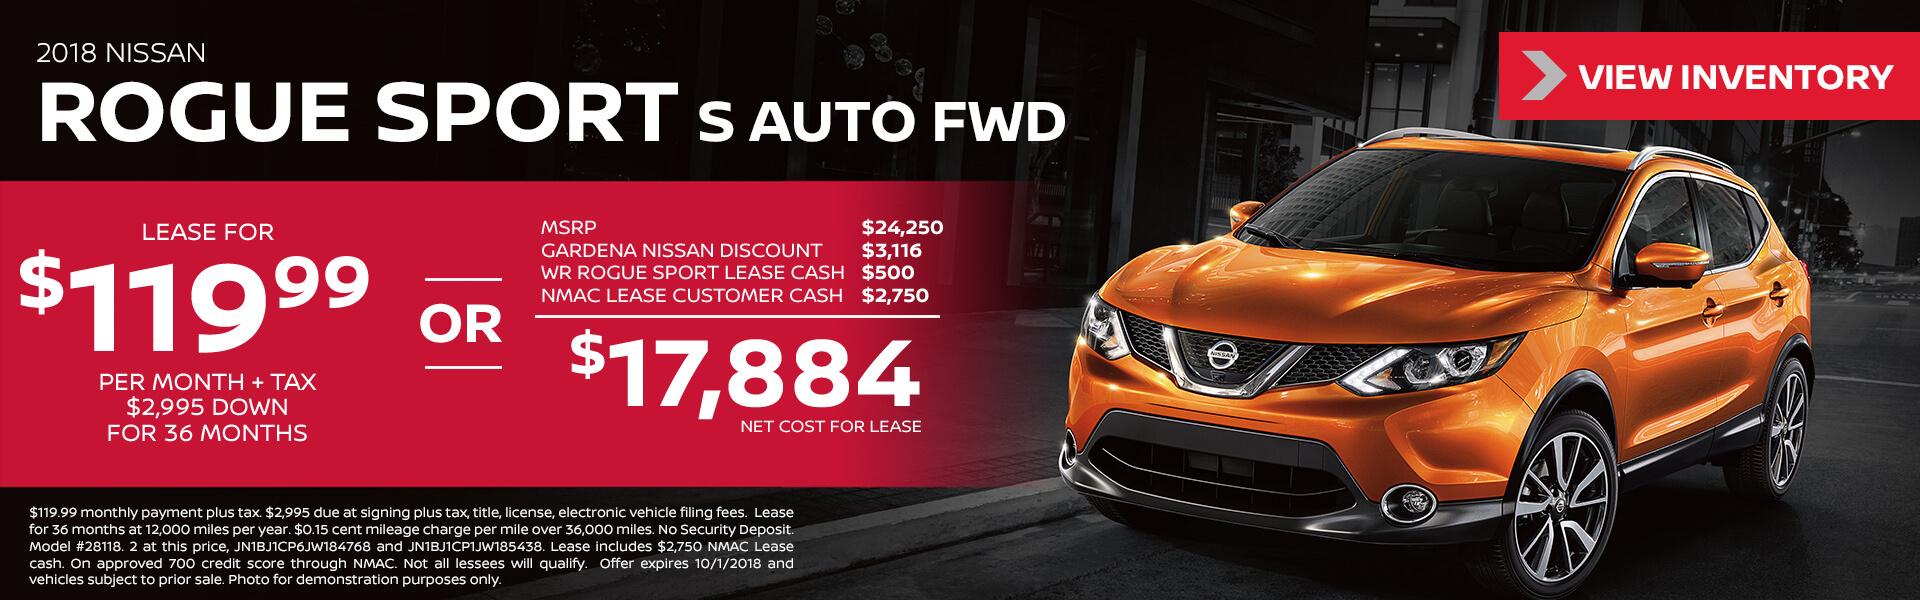 2018 Nissan Rogue Sport $119.99 per month